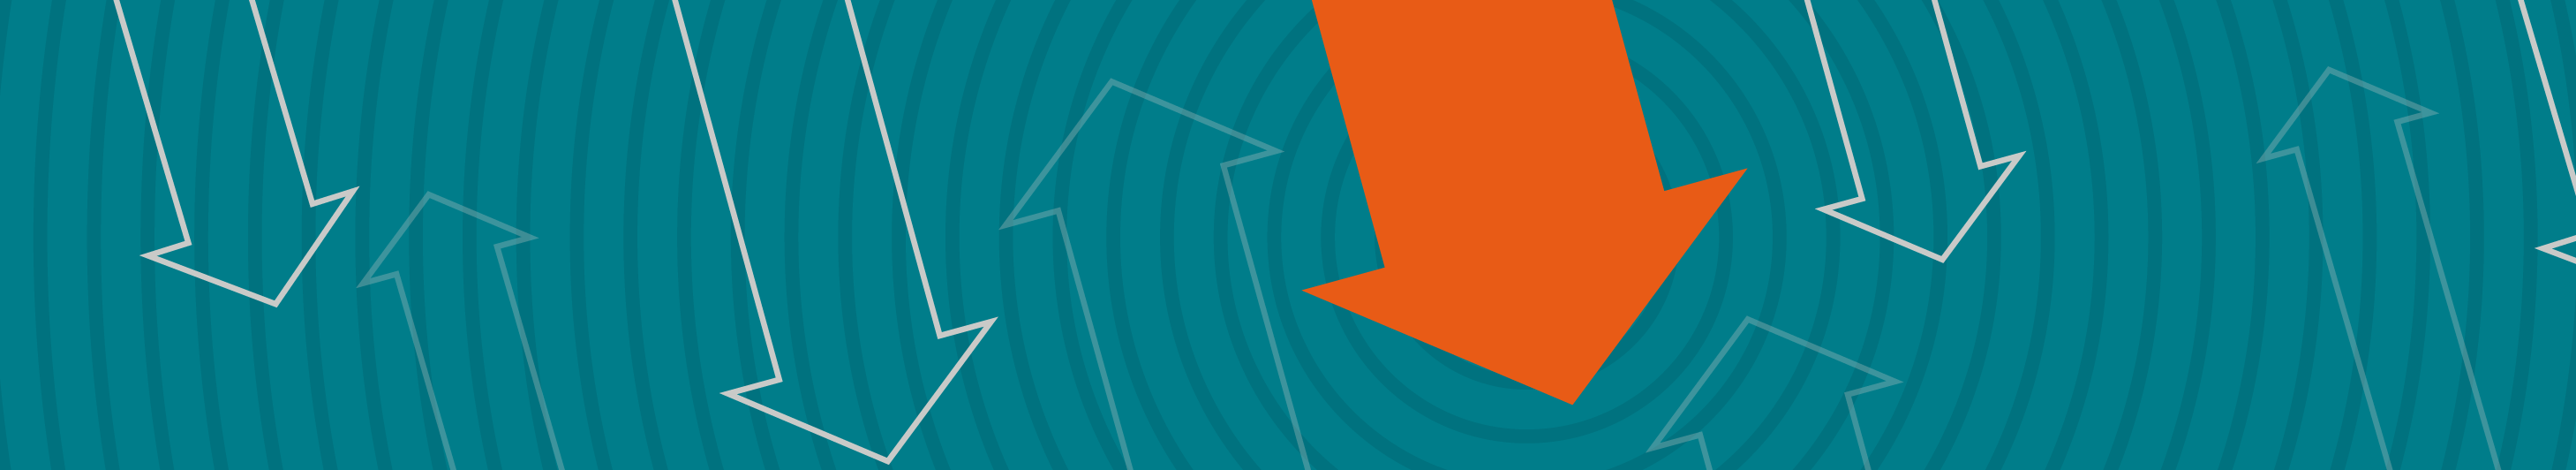 illustration of orange arrow pointing down